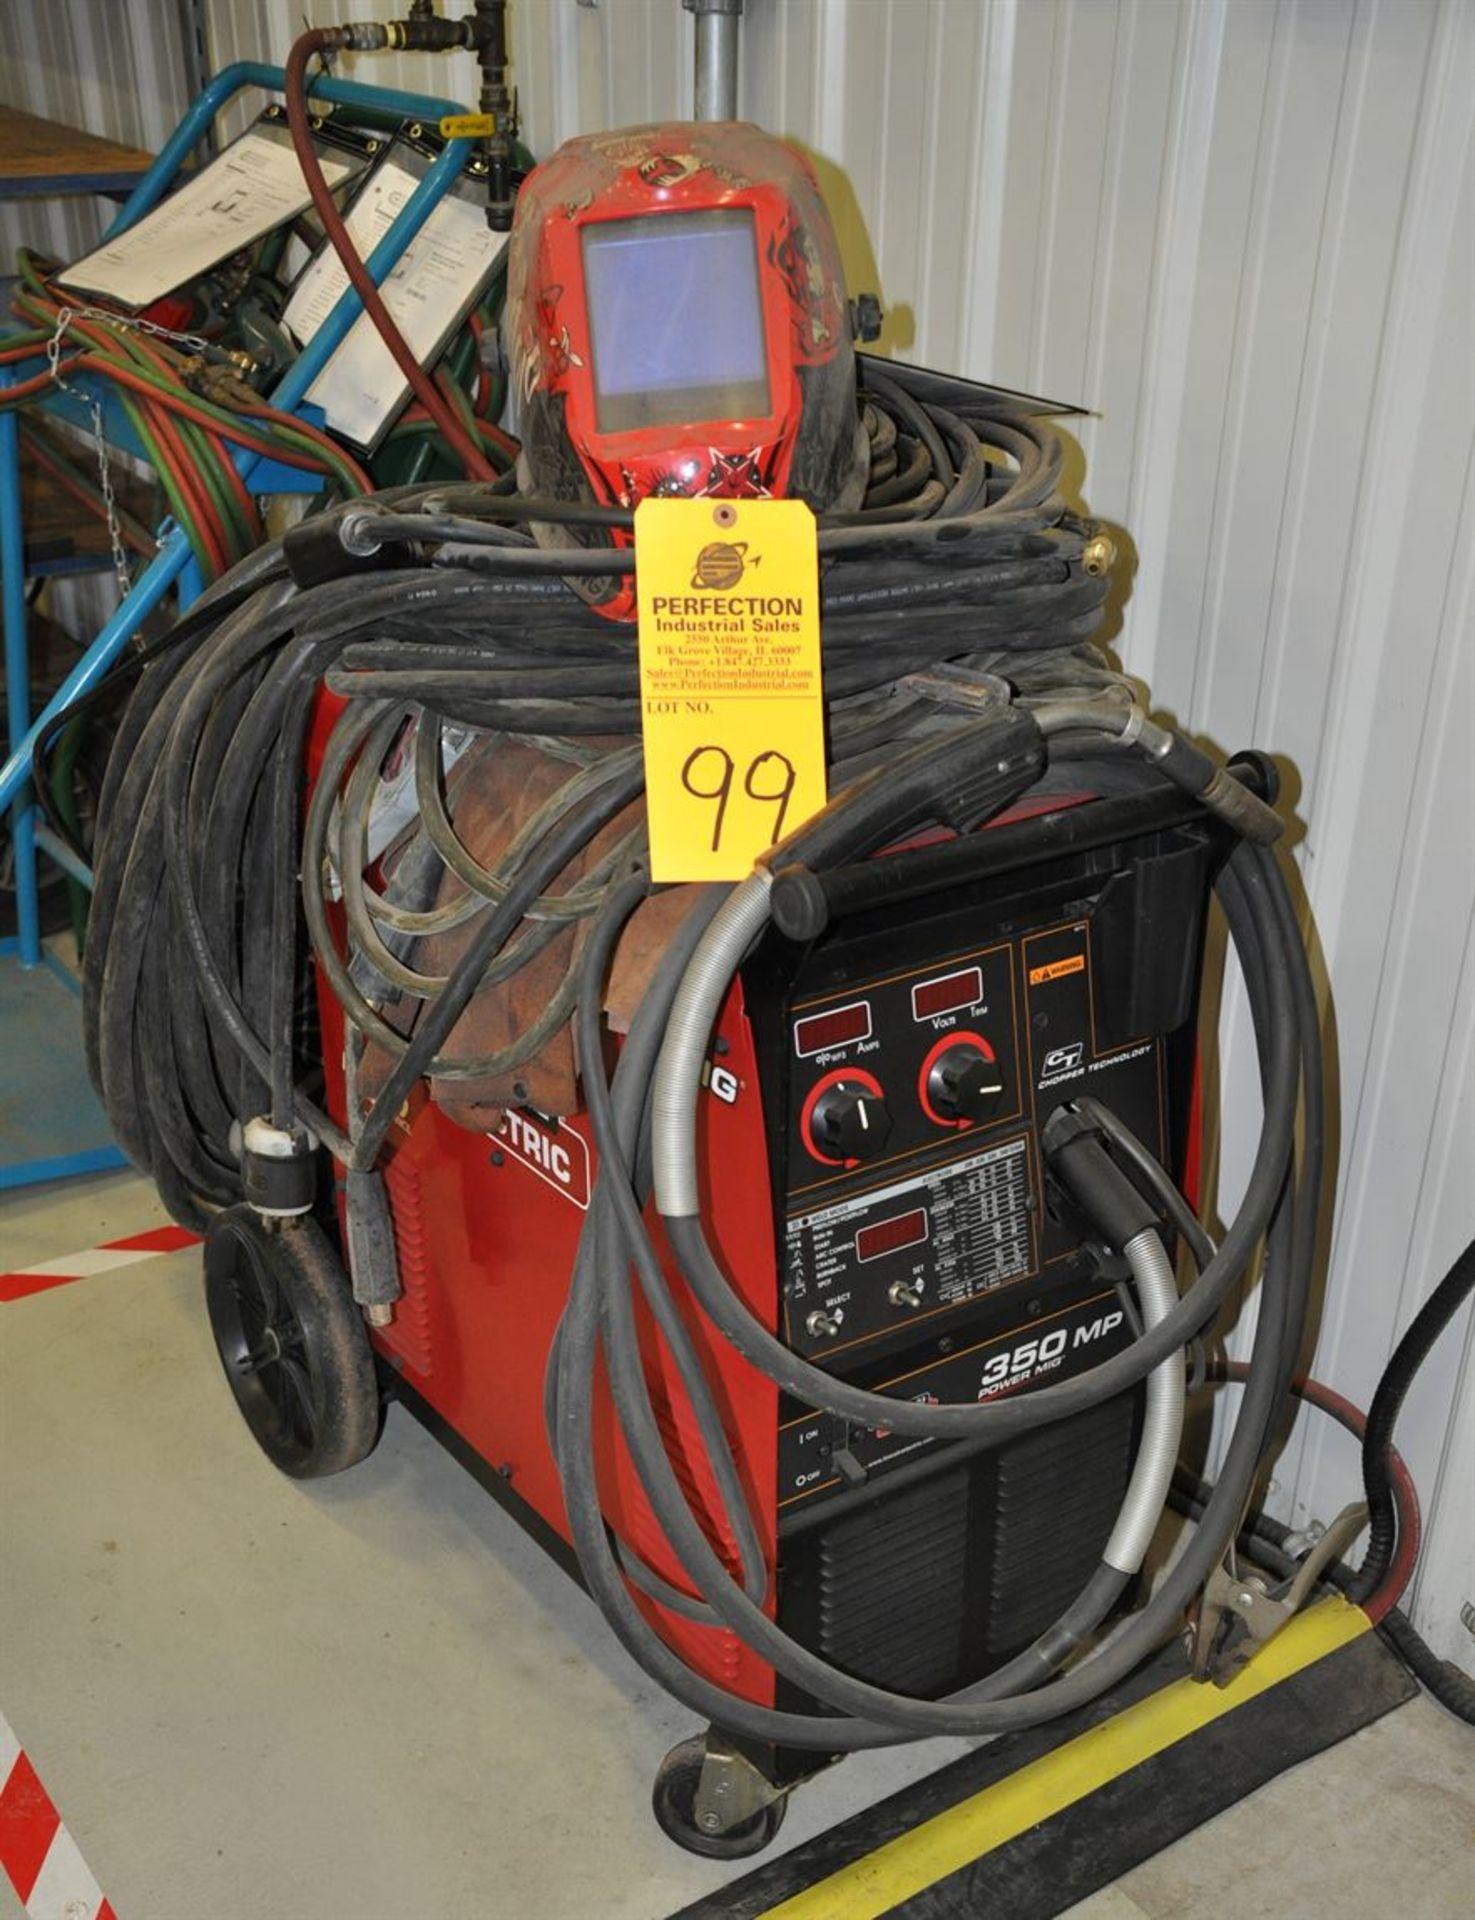 LINCOLN POWER MIG 350MP MIG Welder w/ TIG welding kit and autoshade helmet.